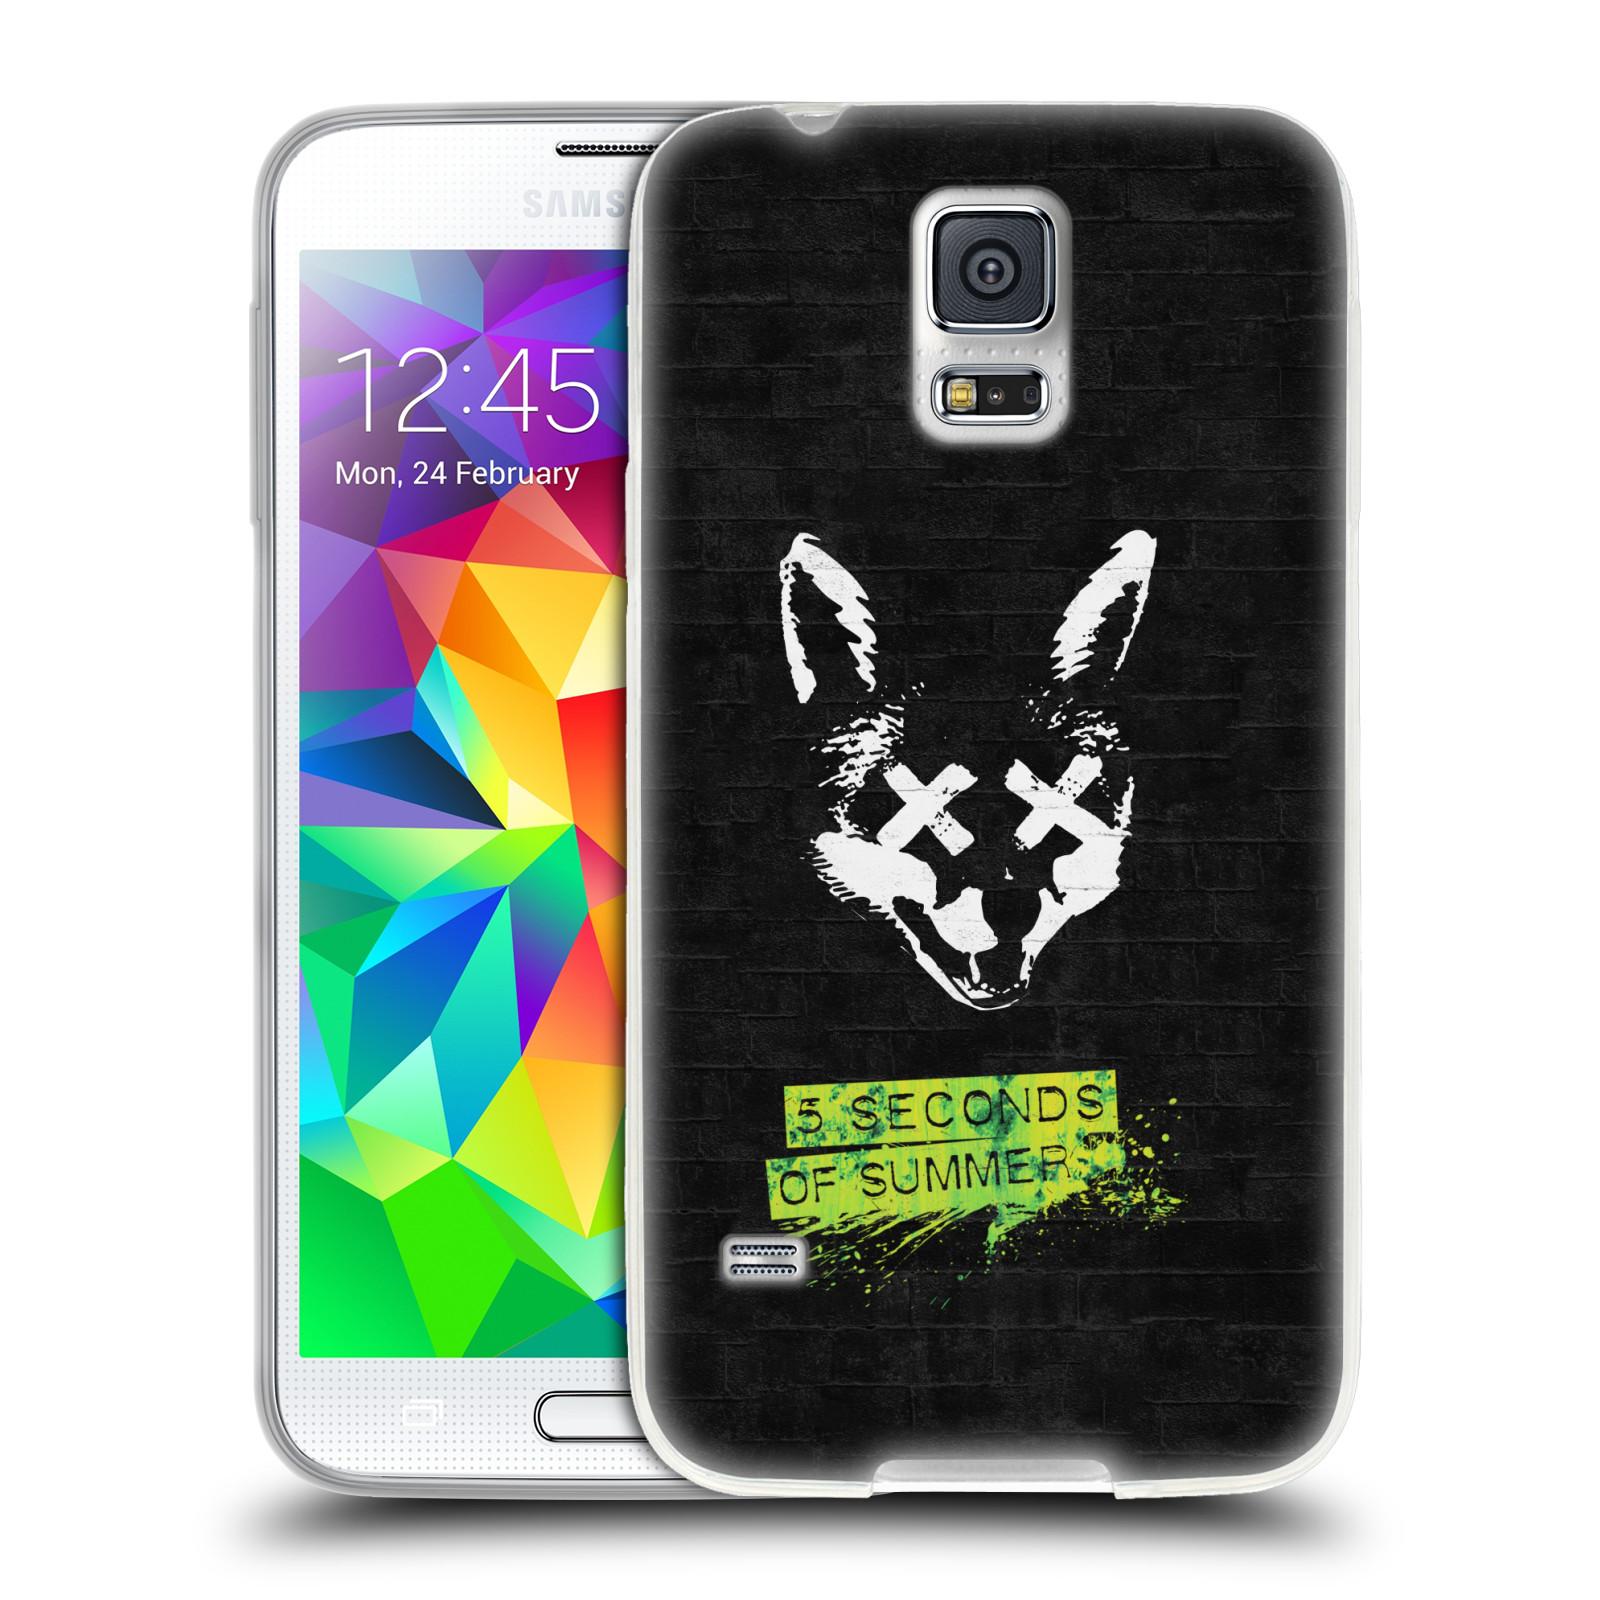 Silikonové pouzdro na mobil Samsung Galaxy S5 Neo HEAD CASE 5 Seconds of Summer - Fox